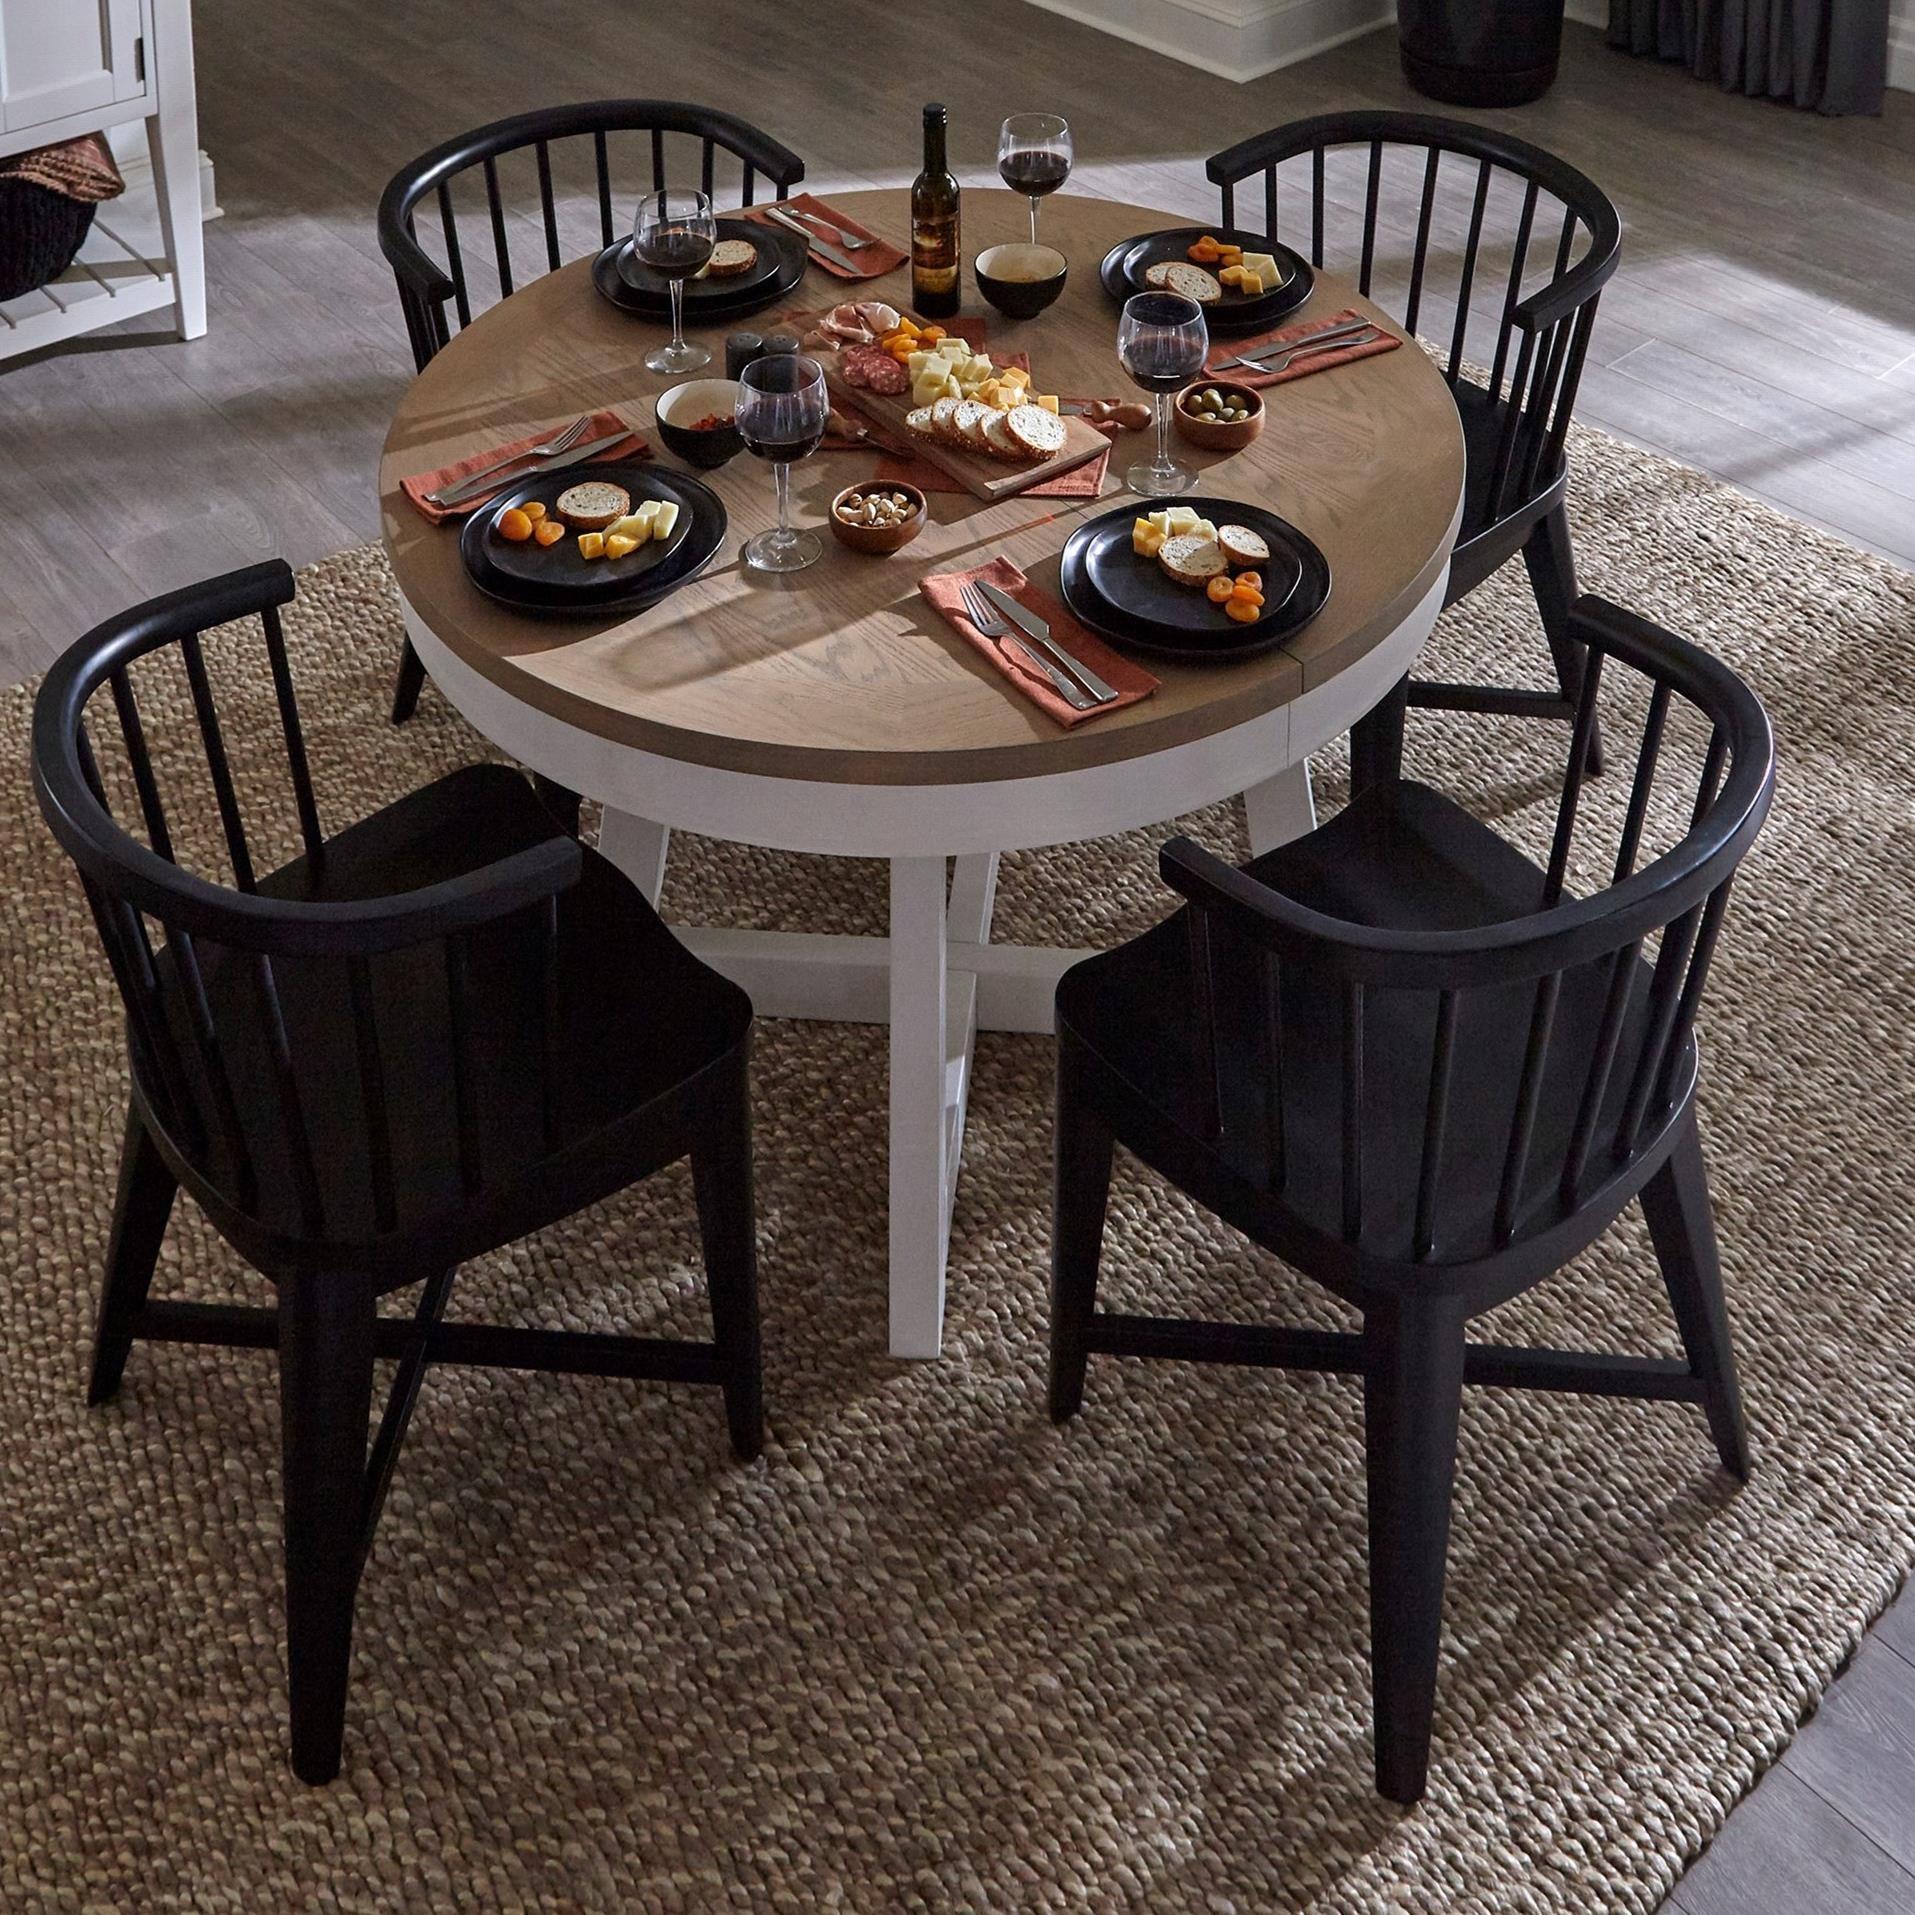 Americana Modern 5-Piece Dining Set by Parker House at Zak's Home